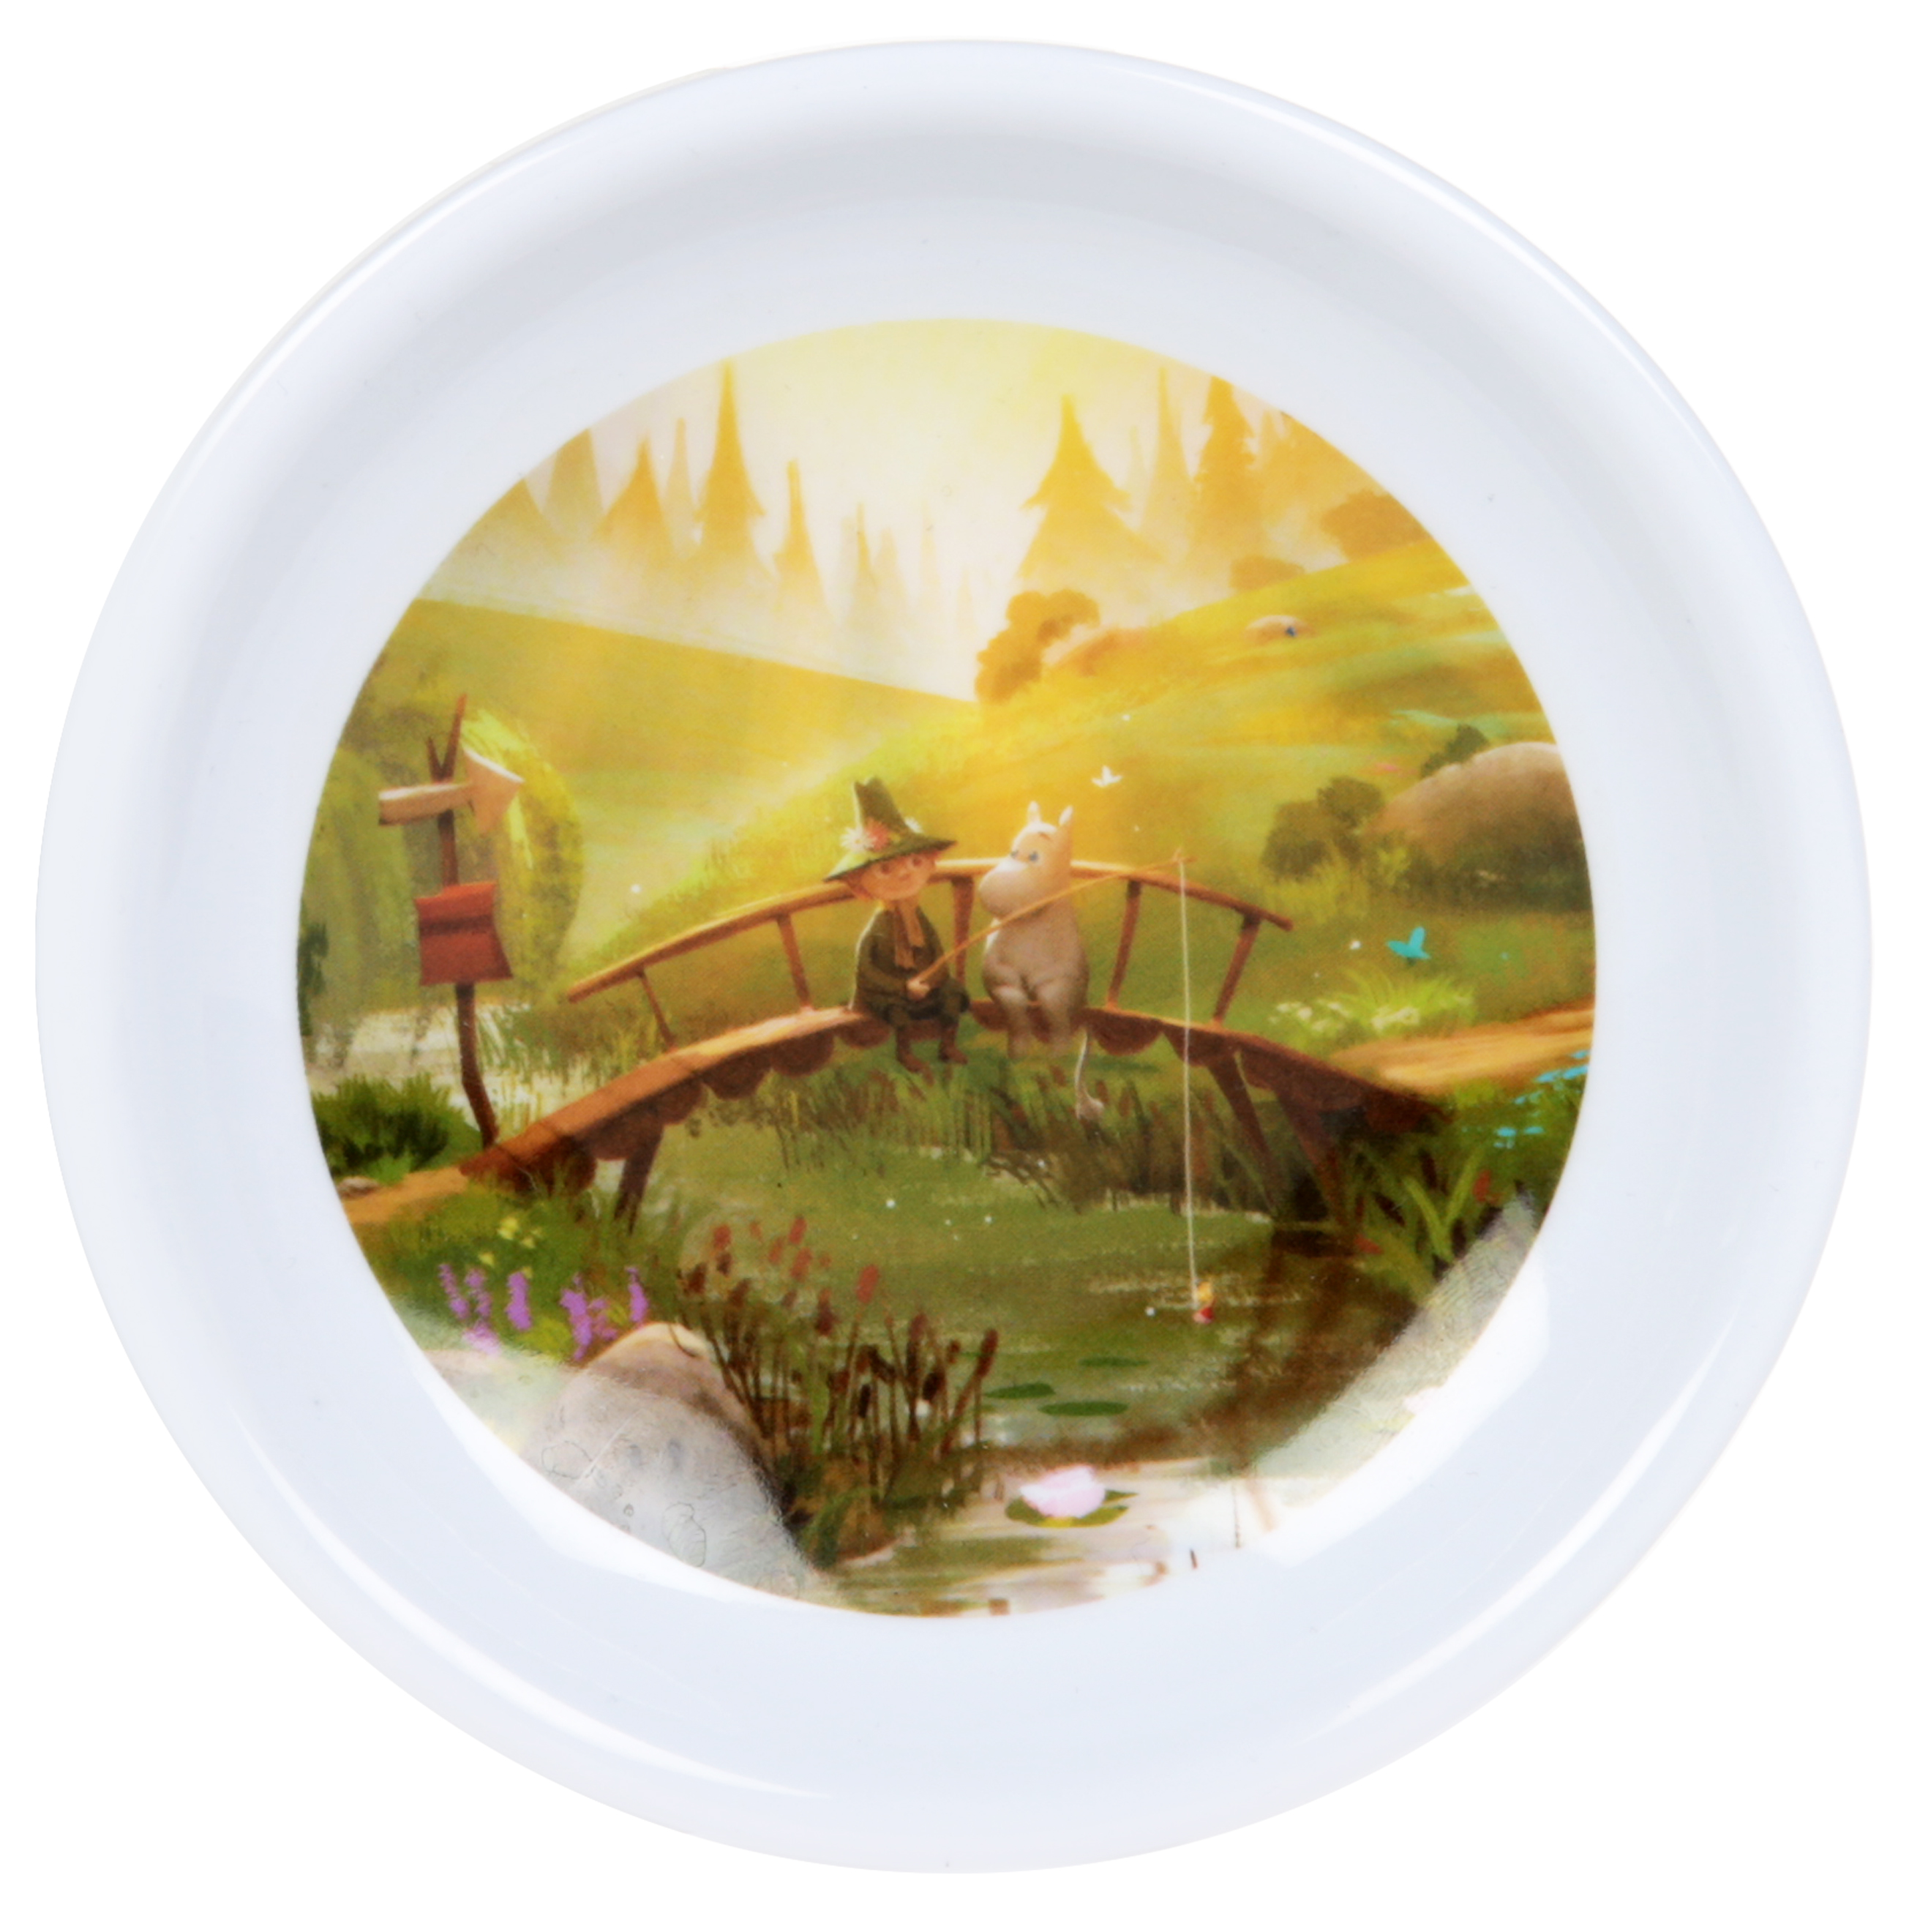 Martinex Moominvalley Animation Tea Bag Holder Fishing